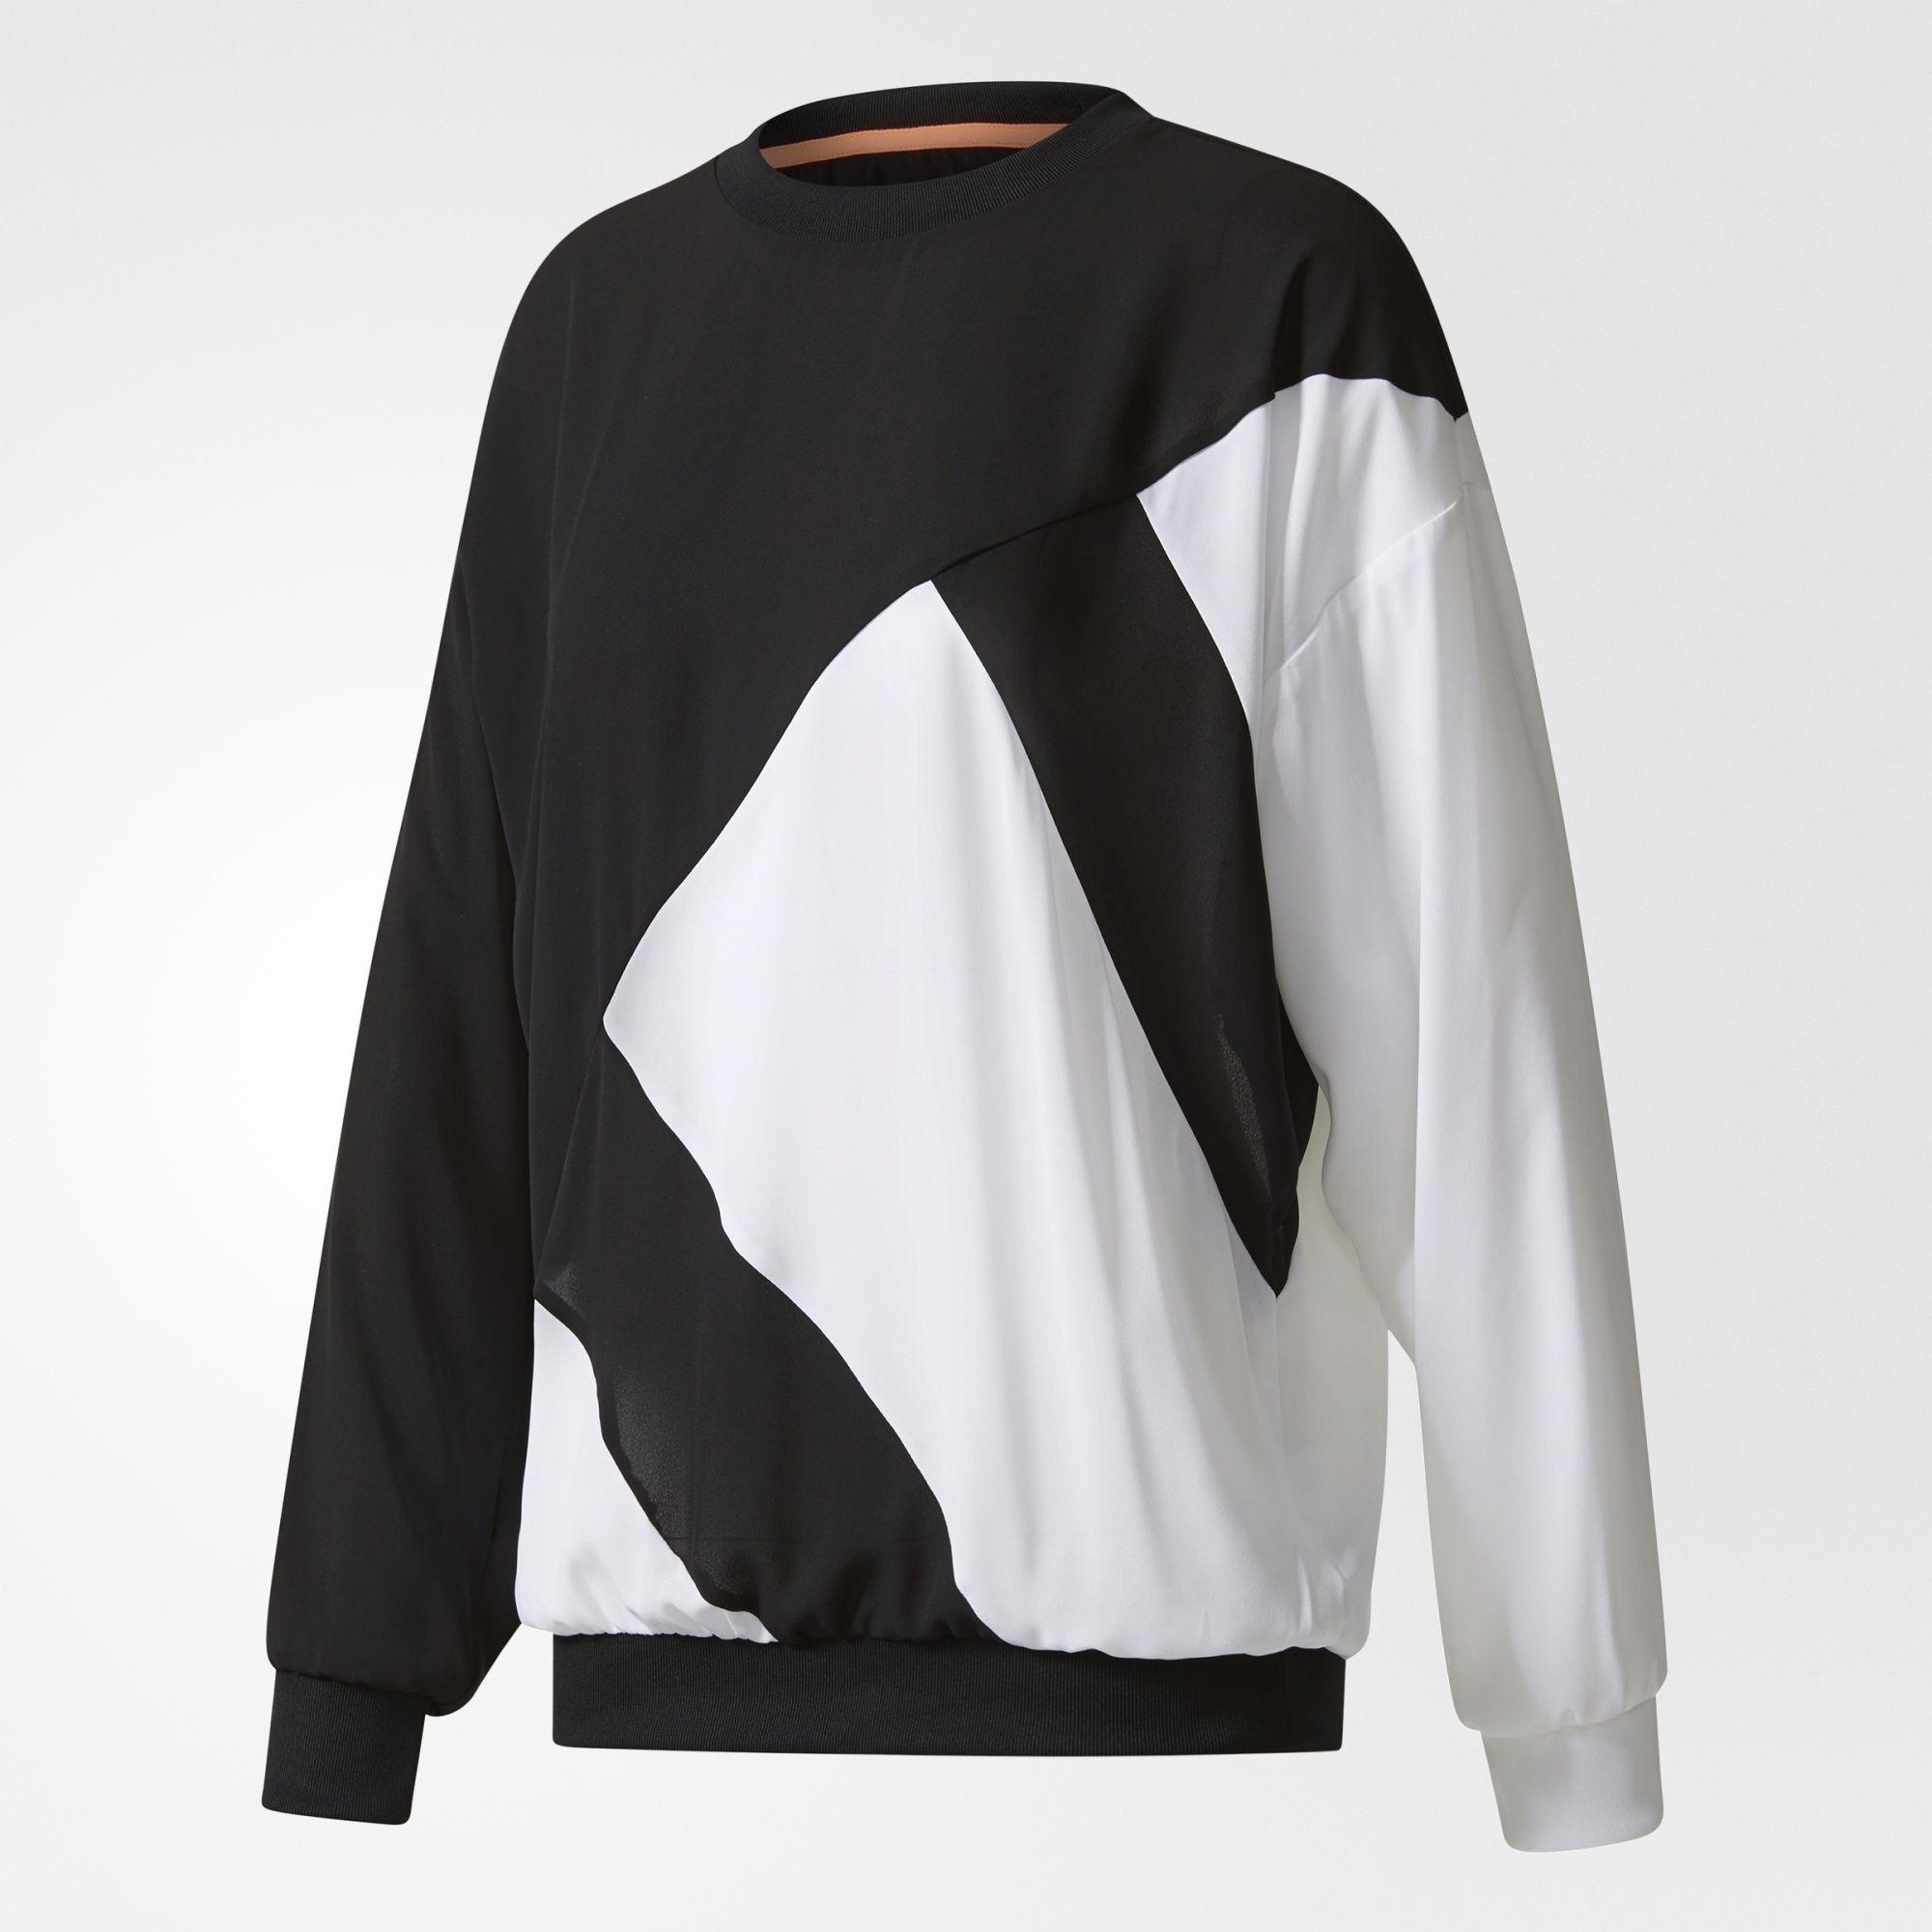 Adidas Eqt Sweatshirt Sweatshirts Women Hoodies Sweatshirts Hoodies Womens [ 2000 x 2000 Pixel ]